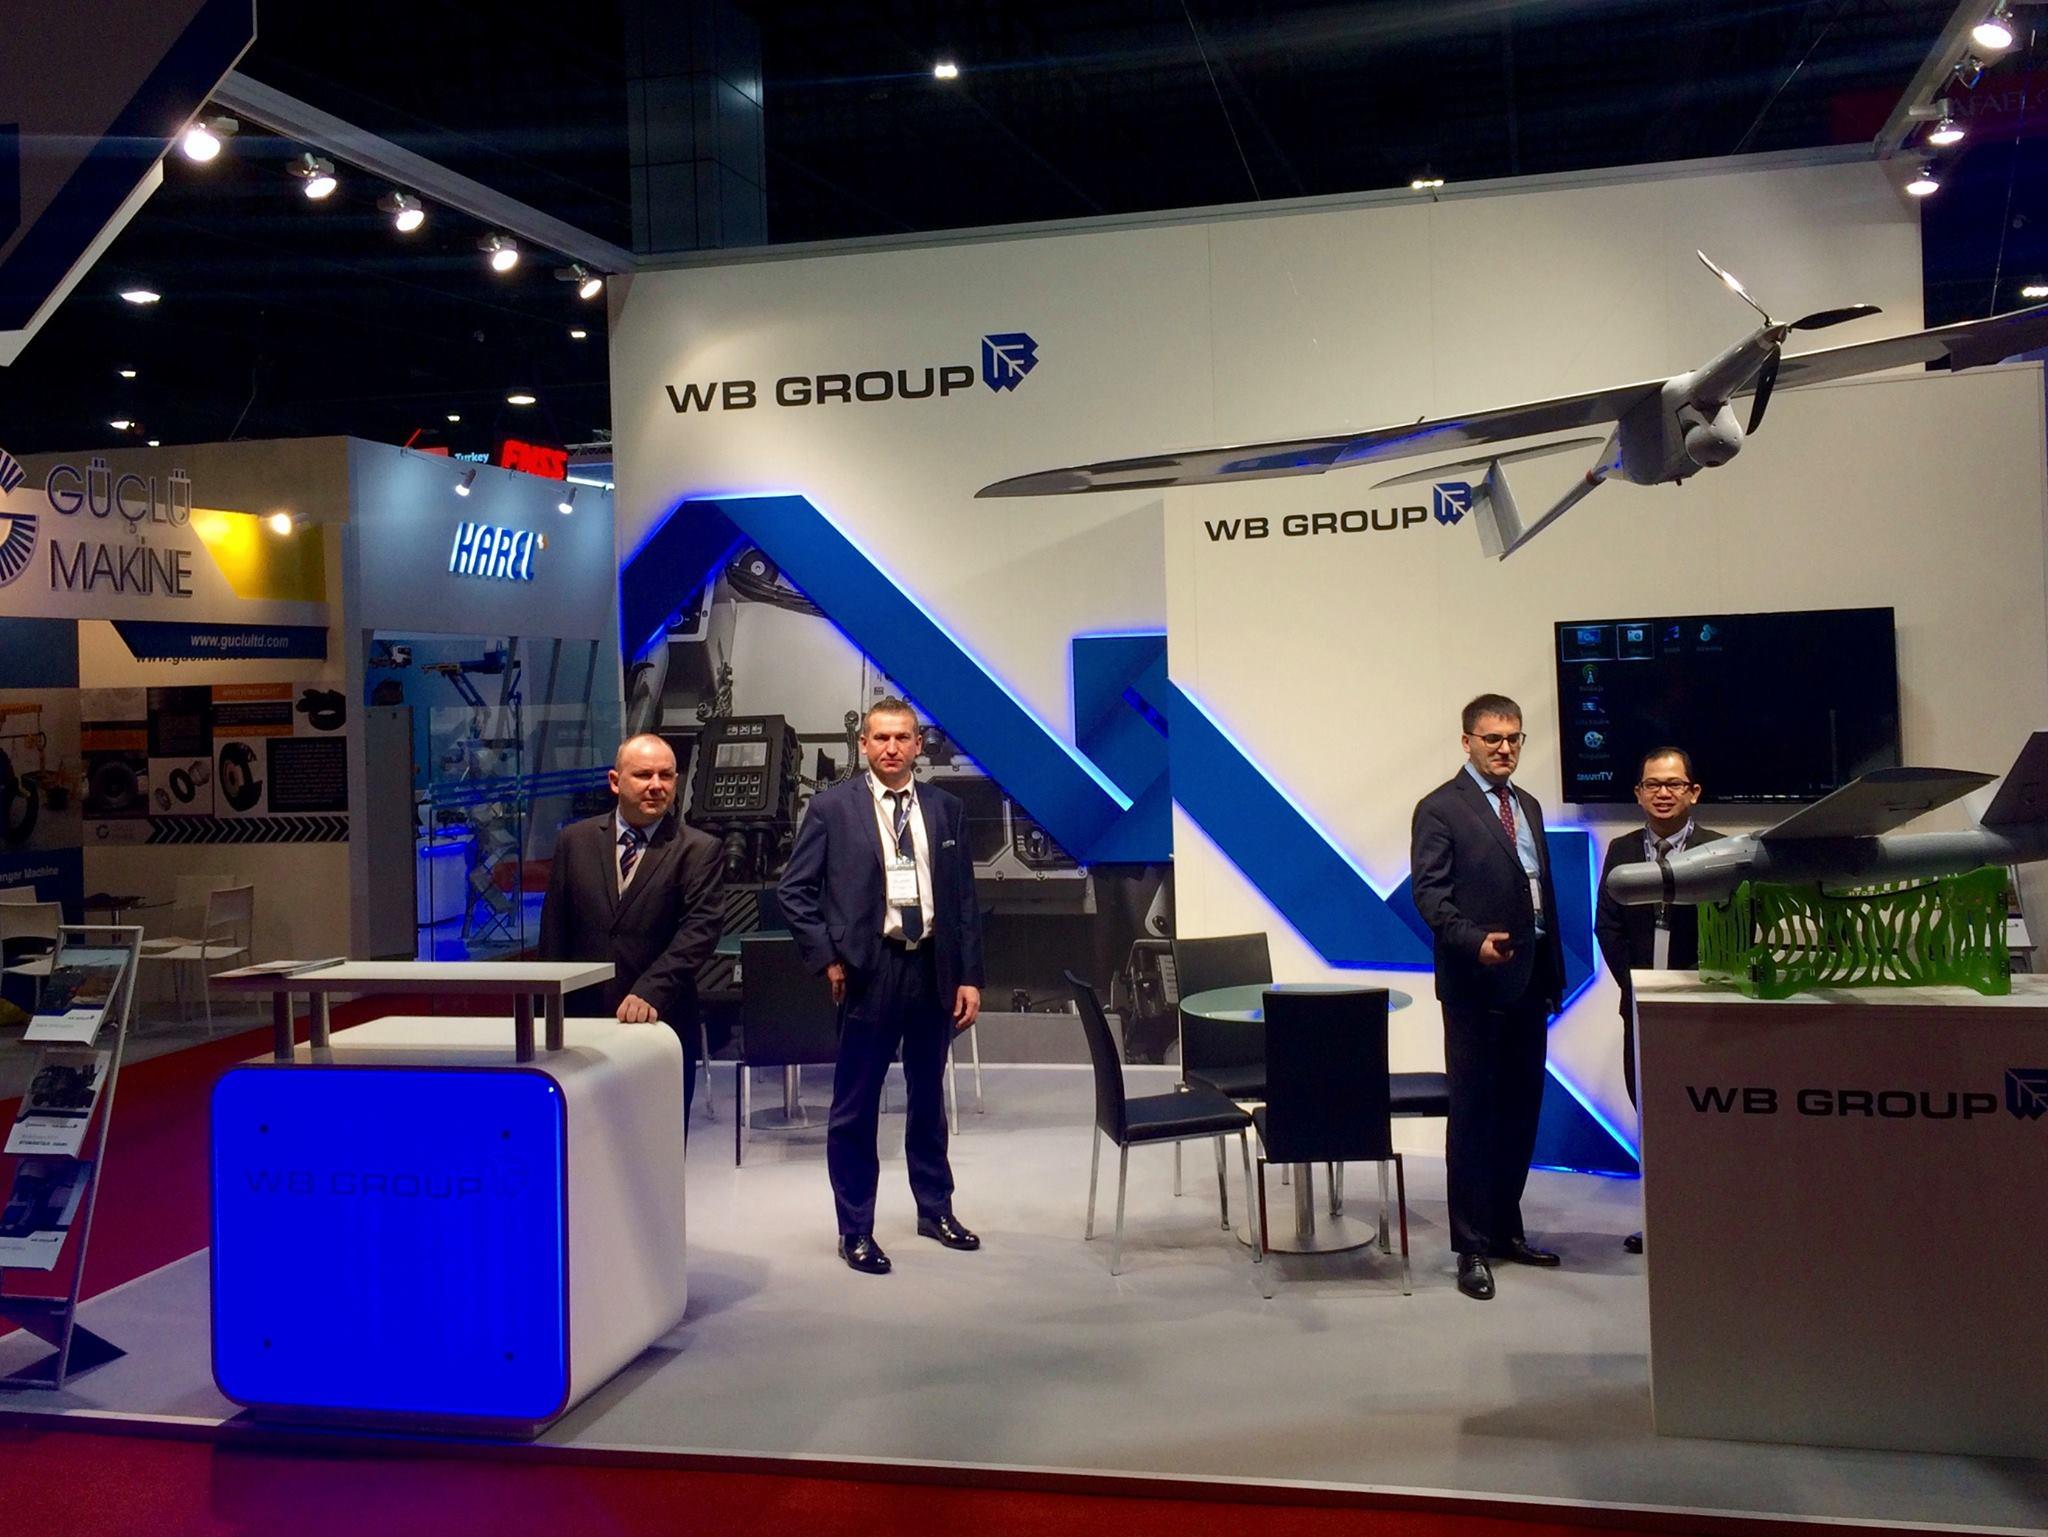 Stoisko WB Group na UMEX 2018 w Abu Dhabi